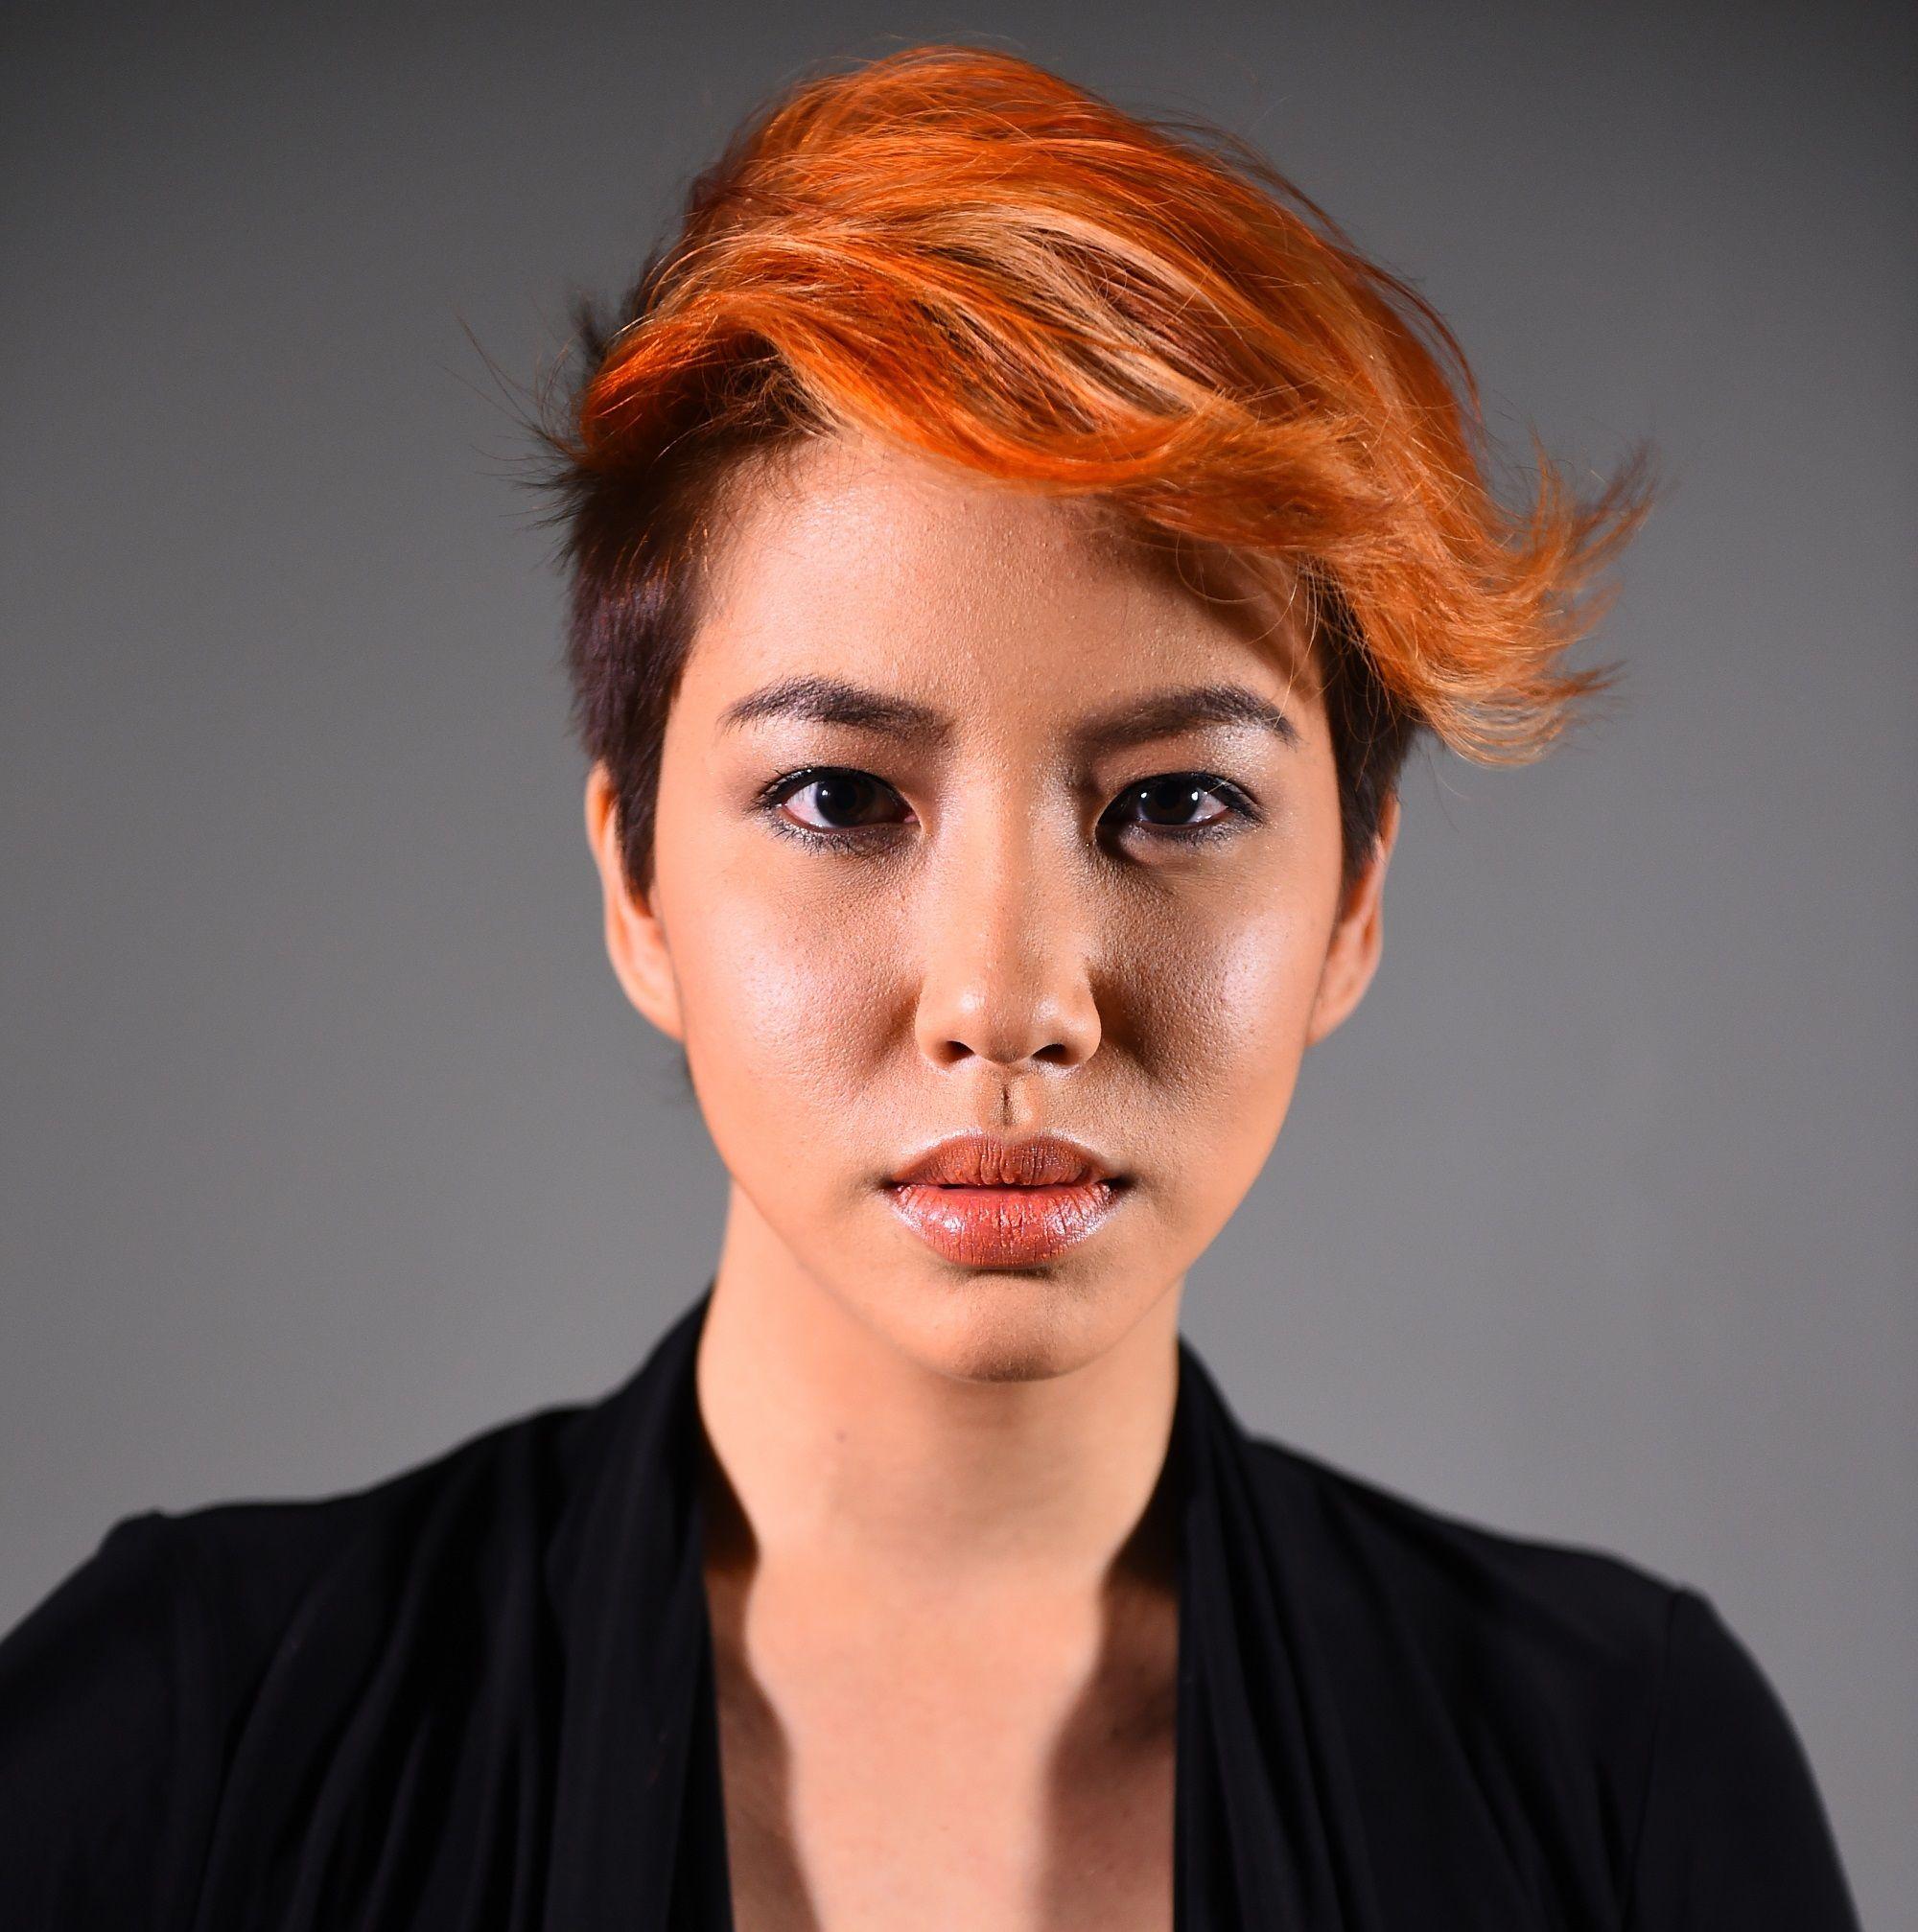 Orange hair: Closeup shot of a woman with orange pixie cut wearing a black blouse